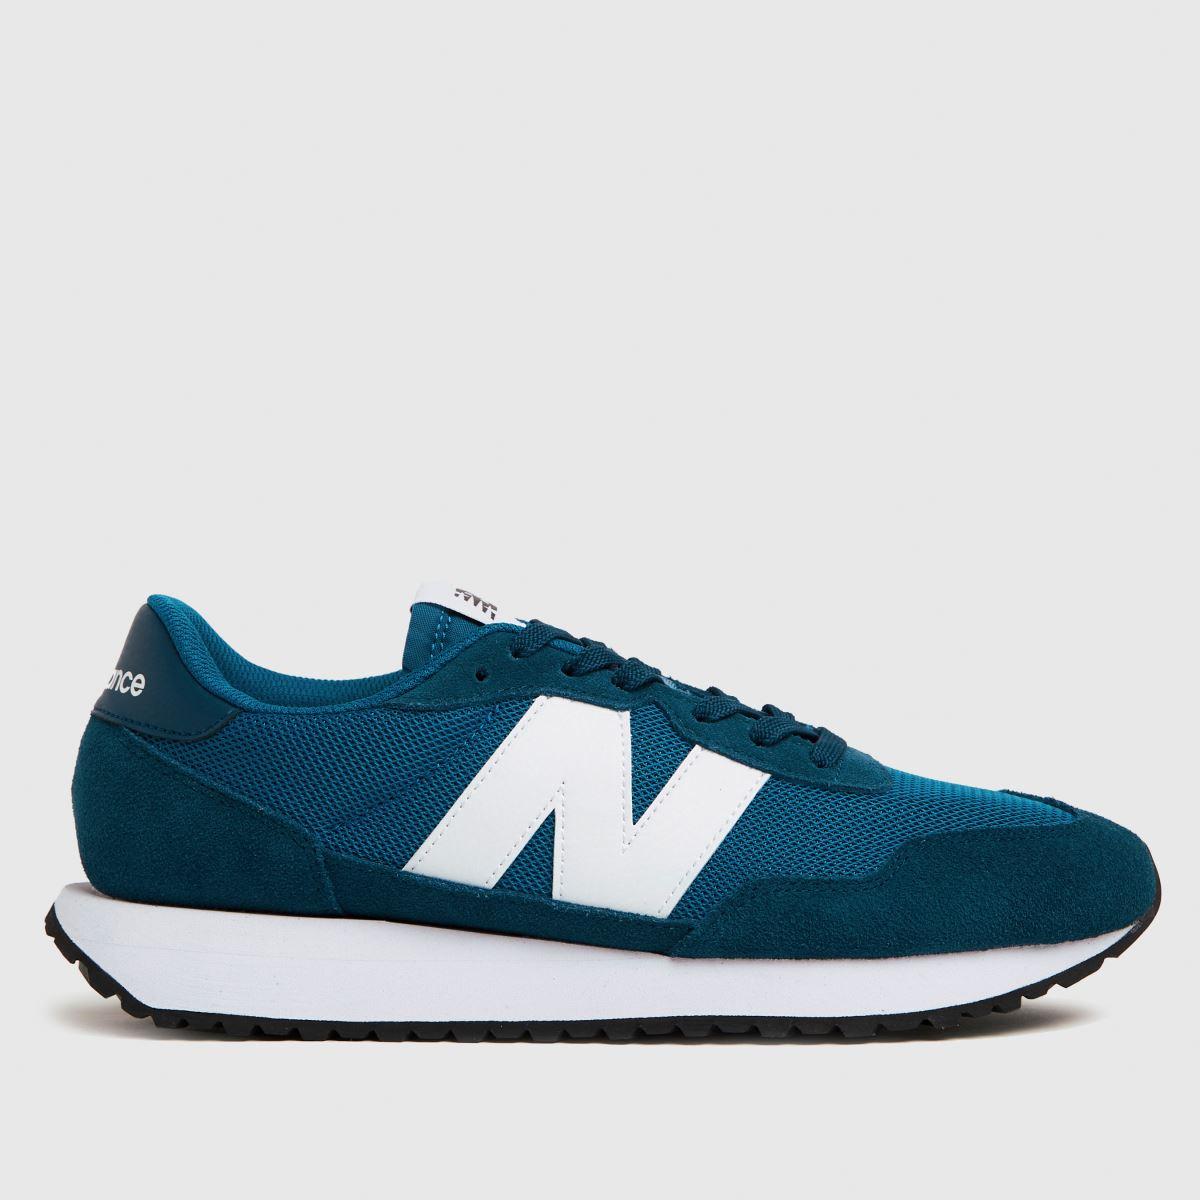 New Balance Blue 237 Trainers